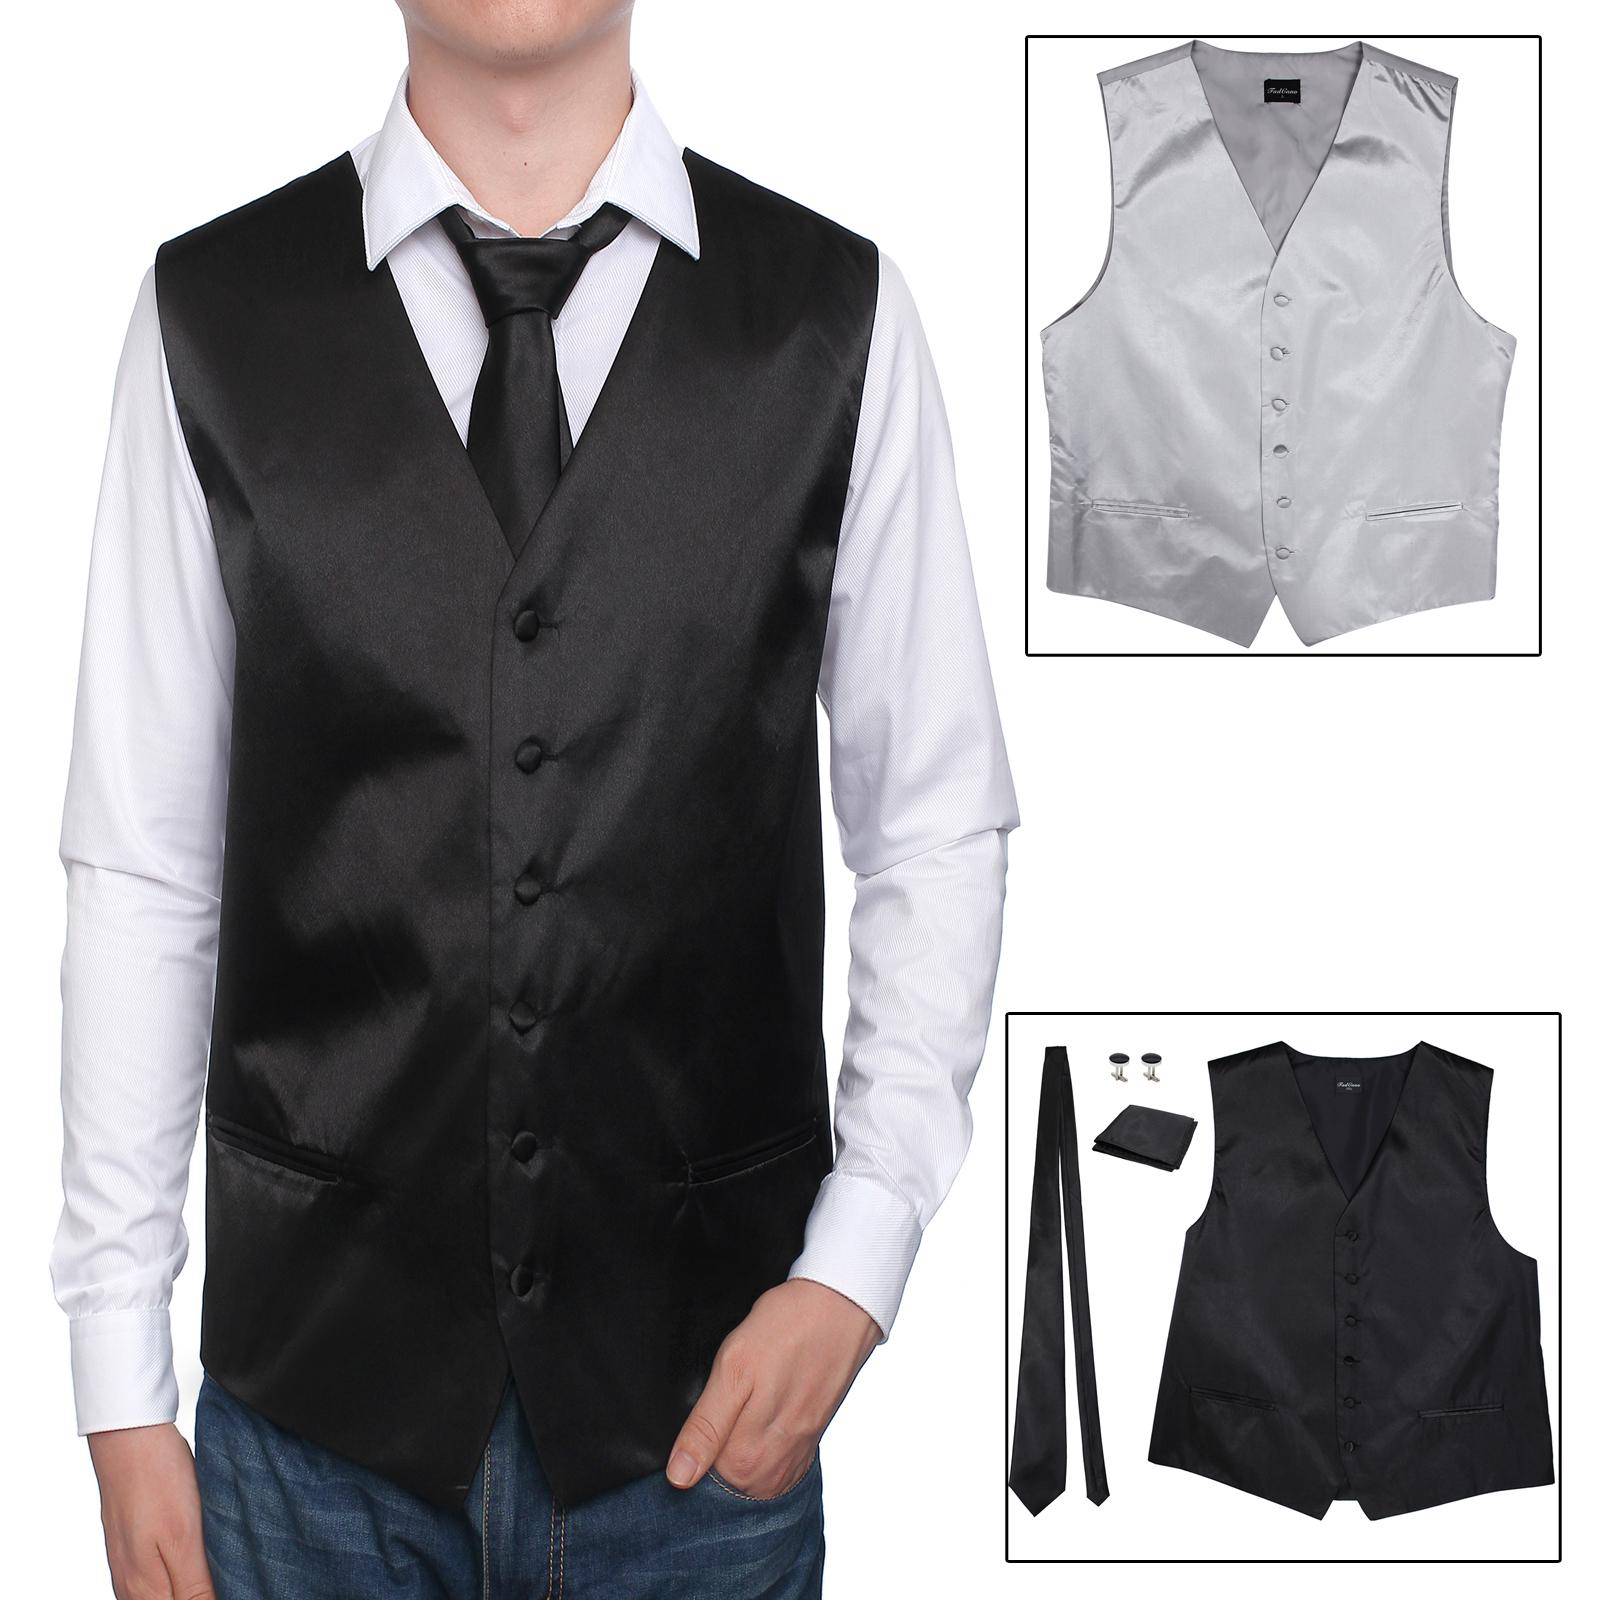 reputación confiable outlet(mk) gran descuento venta Detalles de Traje de chaleco de hombre Corbata Gemelos pañuelo traje casual  para matrimonio